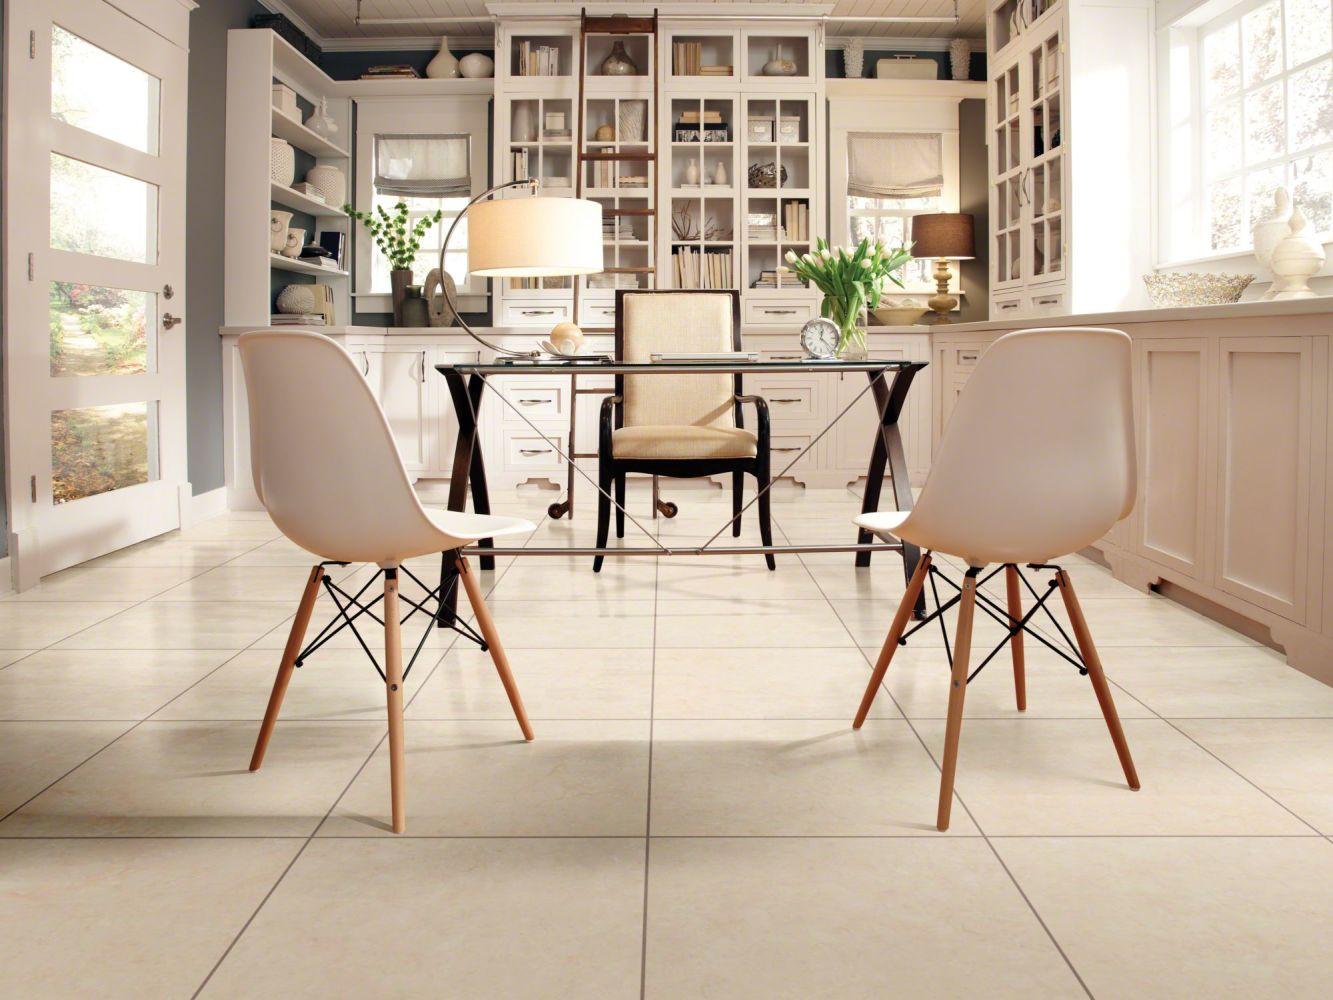 Shaw Floors Resilient Property Solutions Canvas Tile Cobb 00100_VE149